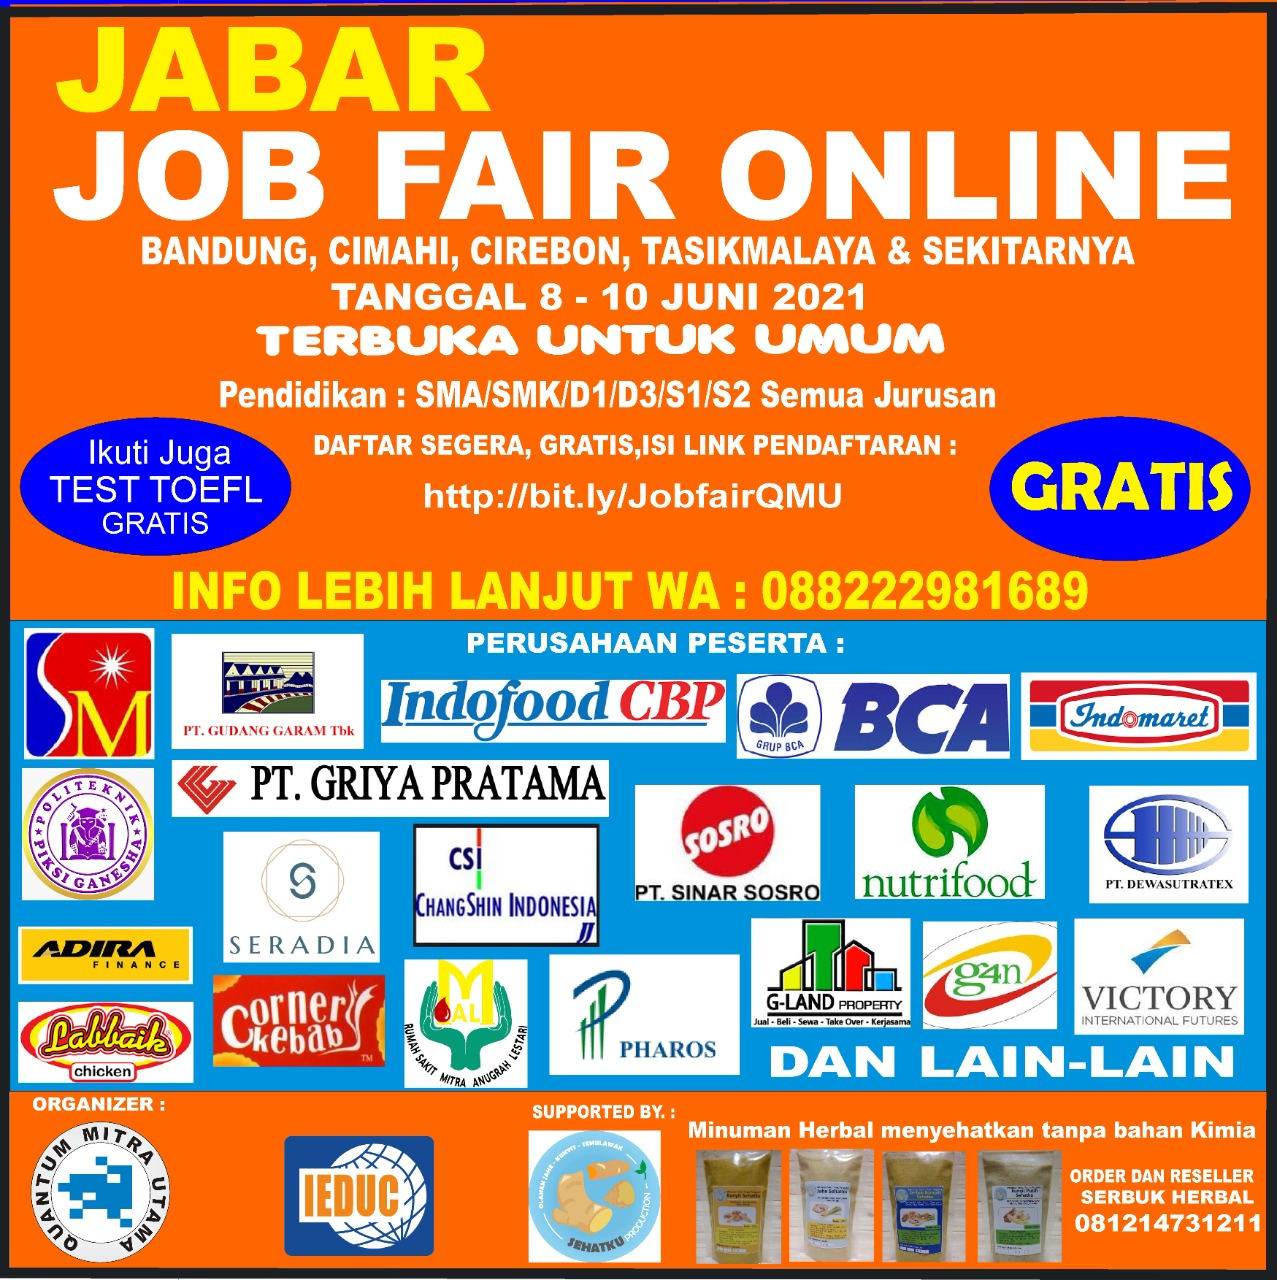 Jabar Job Fair Online 8 - 10 Juni 2021